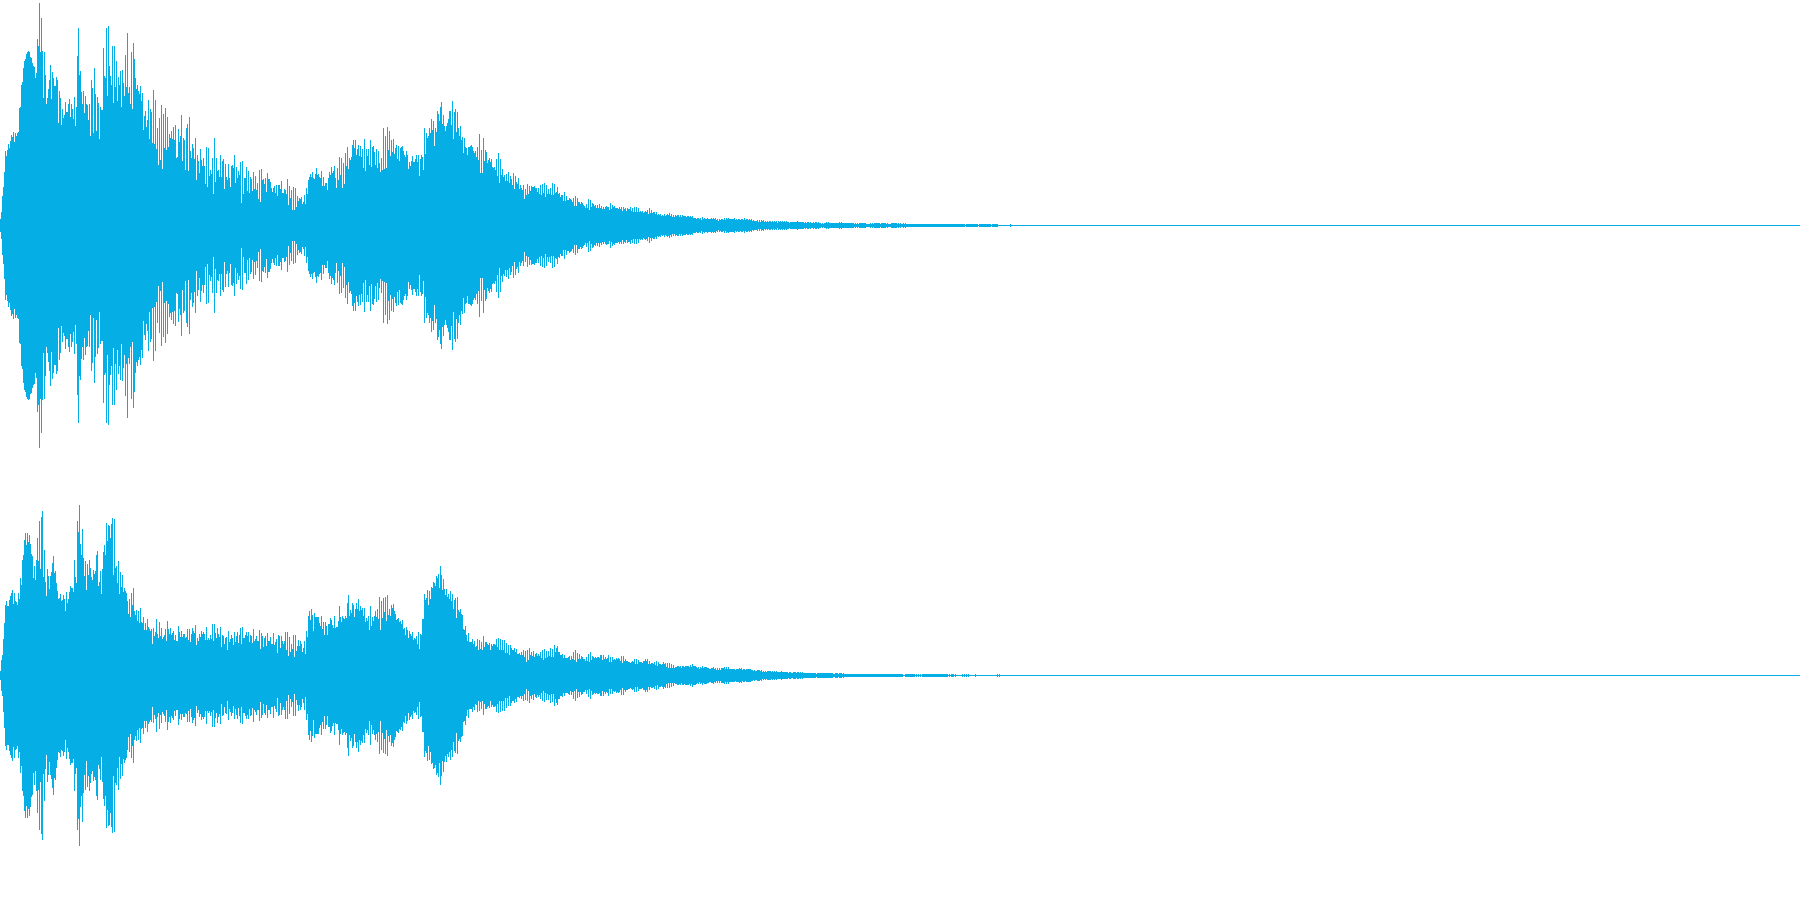 理科 化学 実験 変化 不思議 18の再生済みの波形